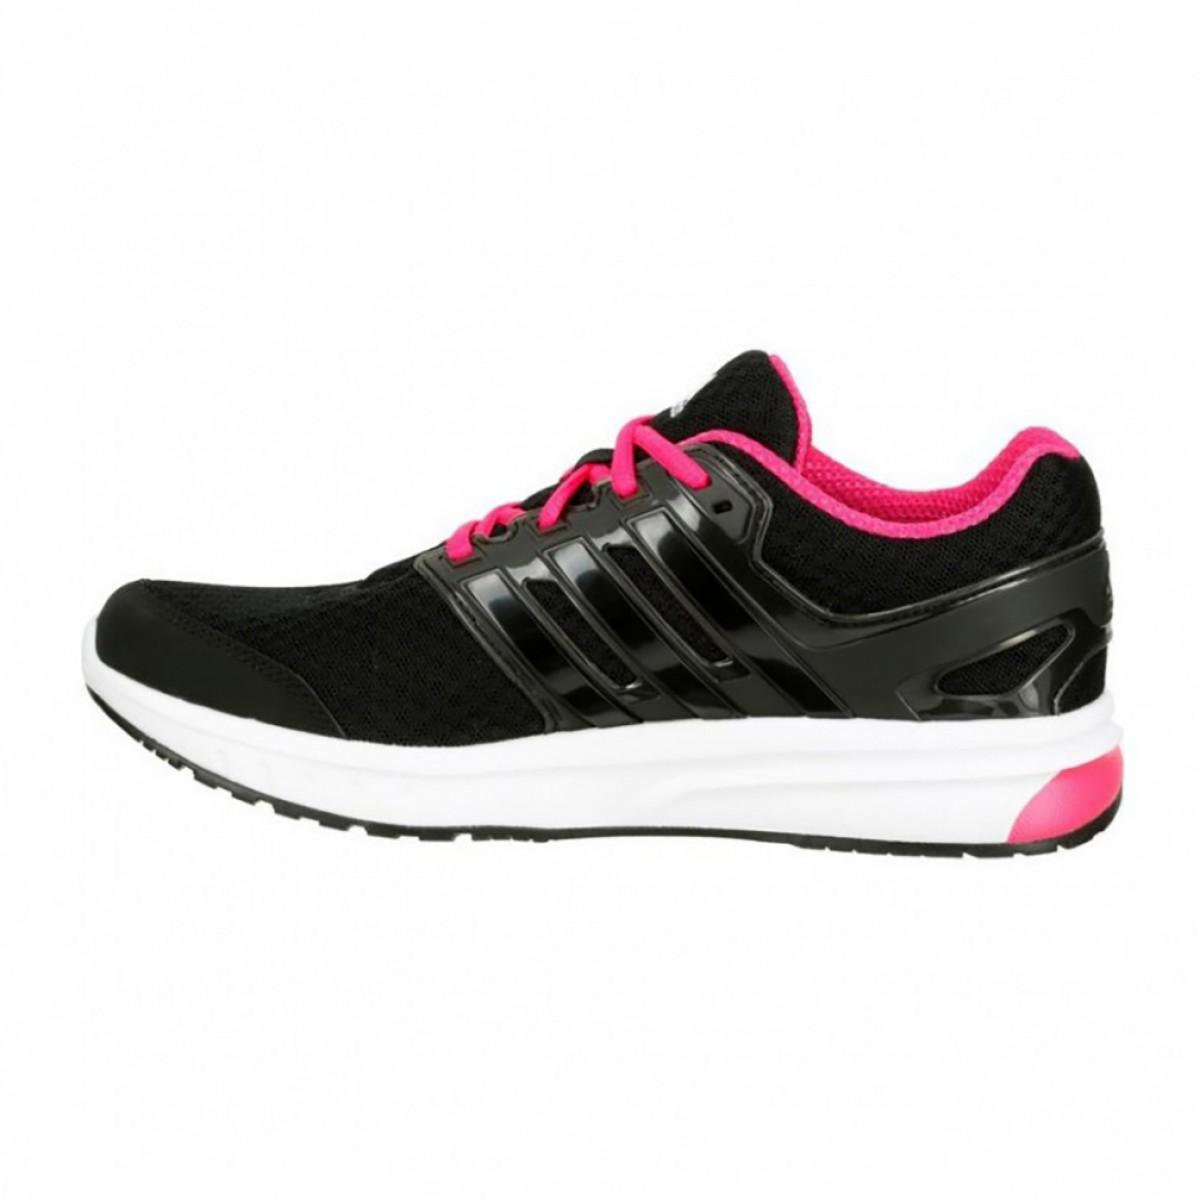 d092d5d8de9 ... Tênis Adidas Galaxy Elite Feminino - Preto e Rosa ...